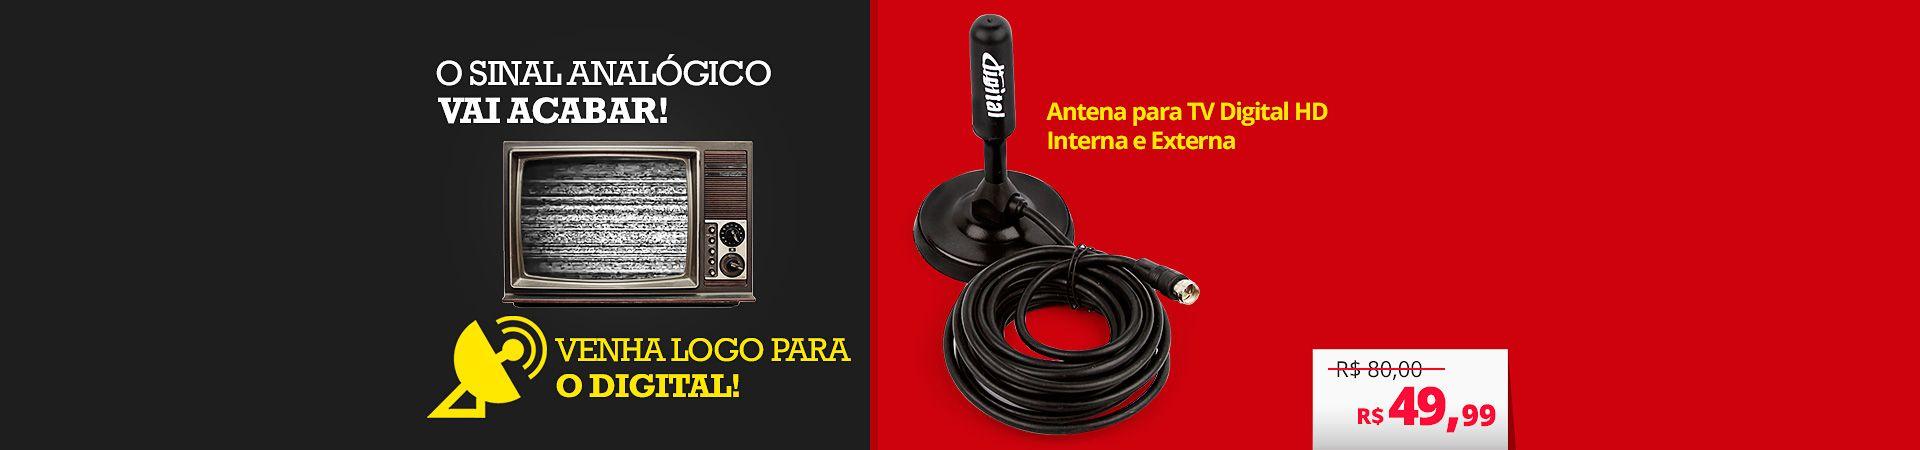 Antena Digital Interna e Externa